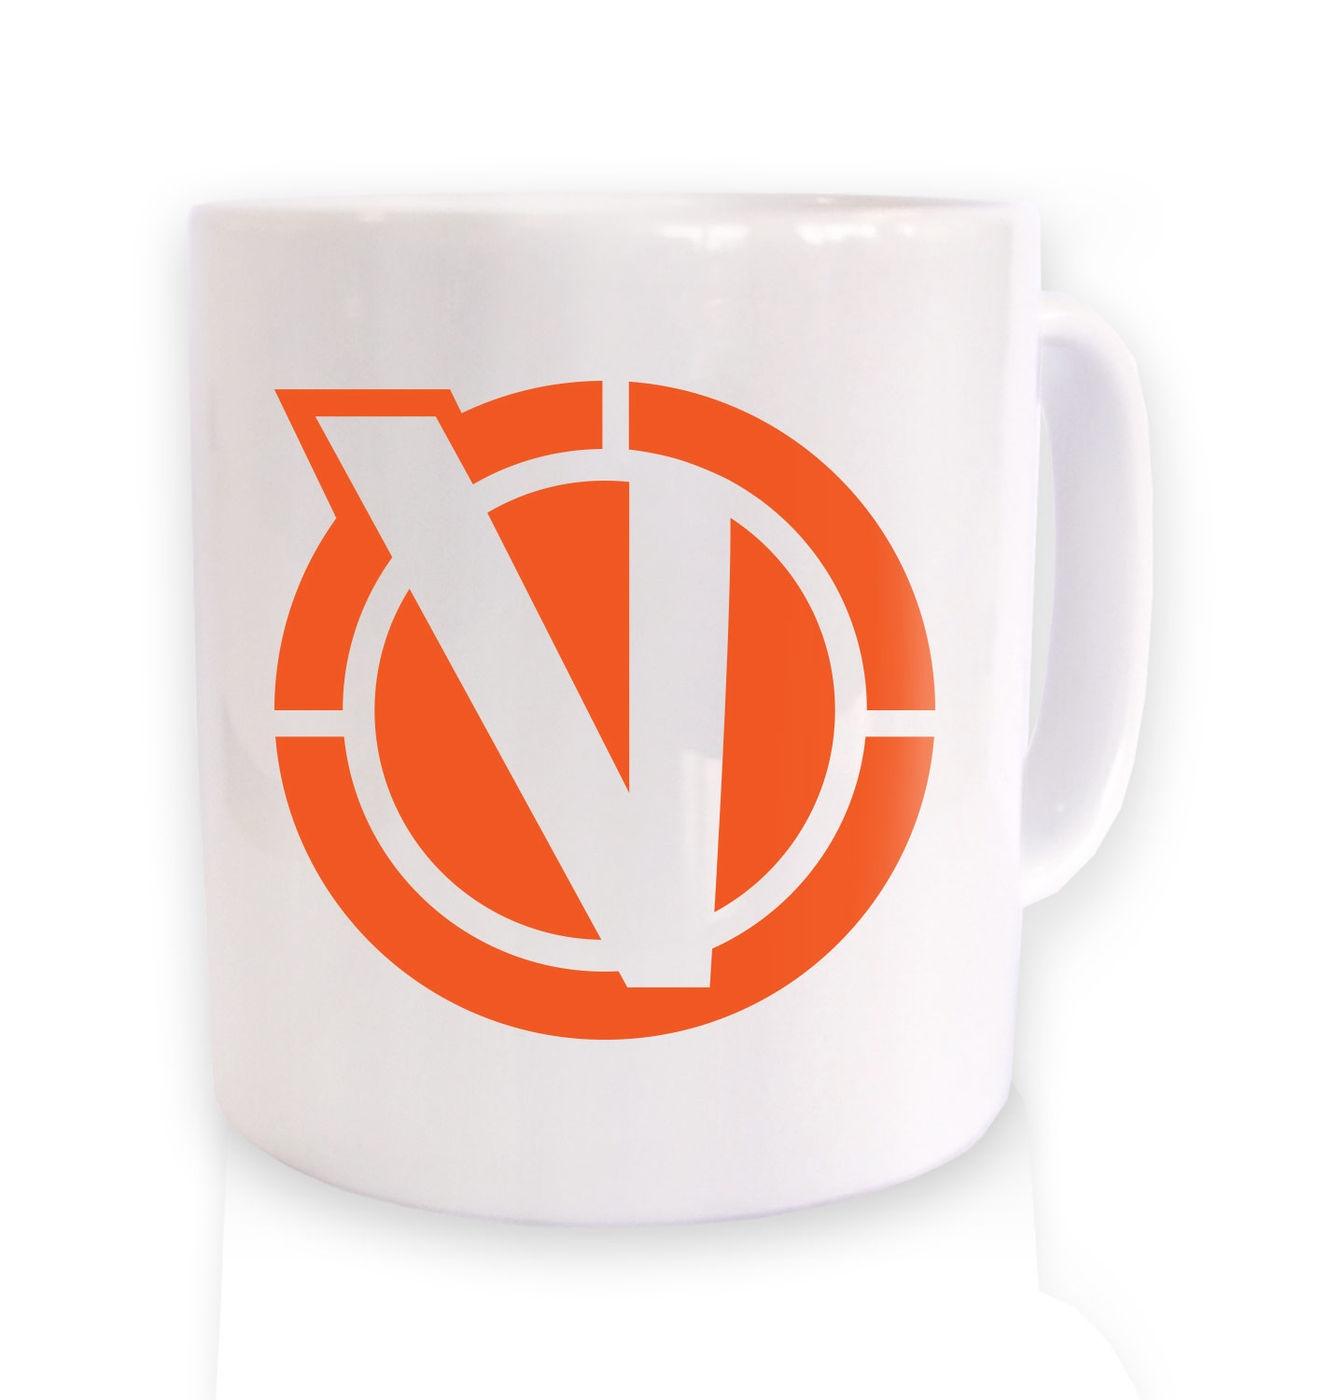 Vindicators mug by Something Geeky